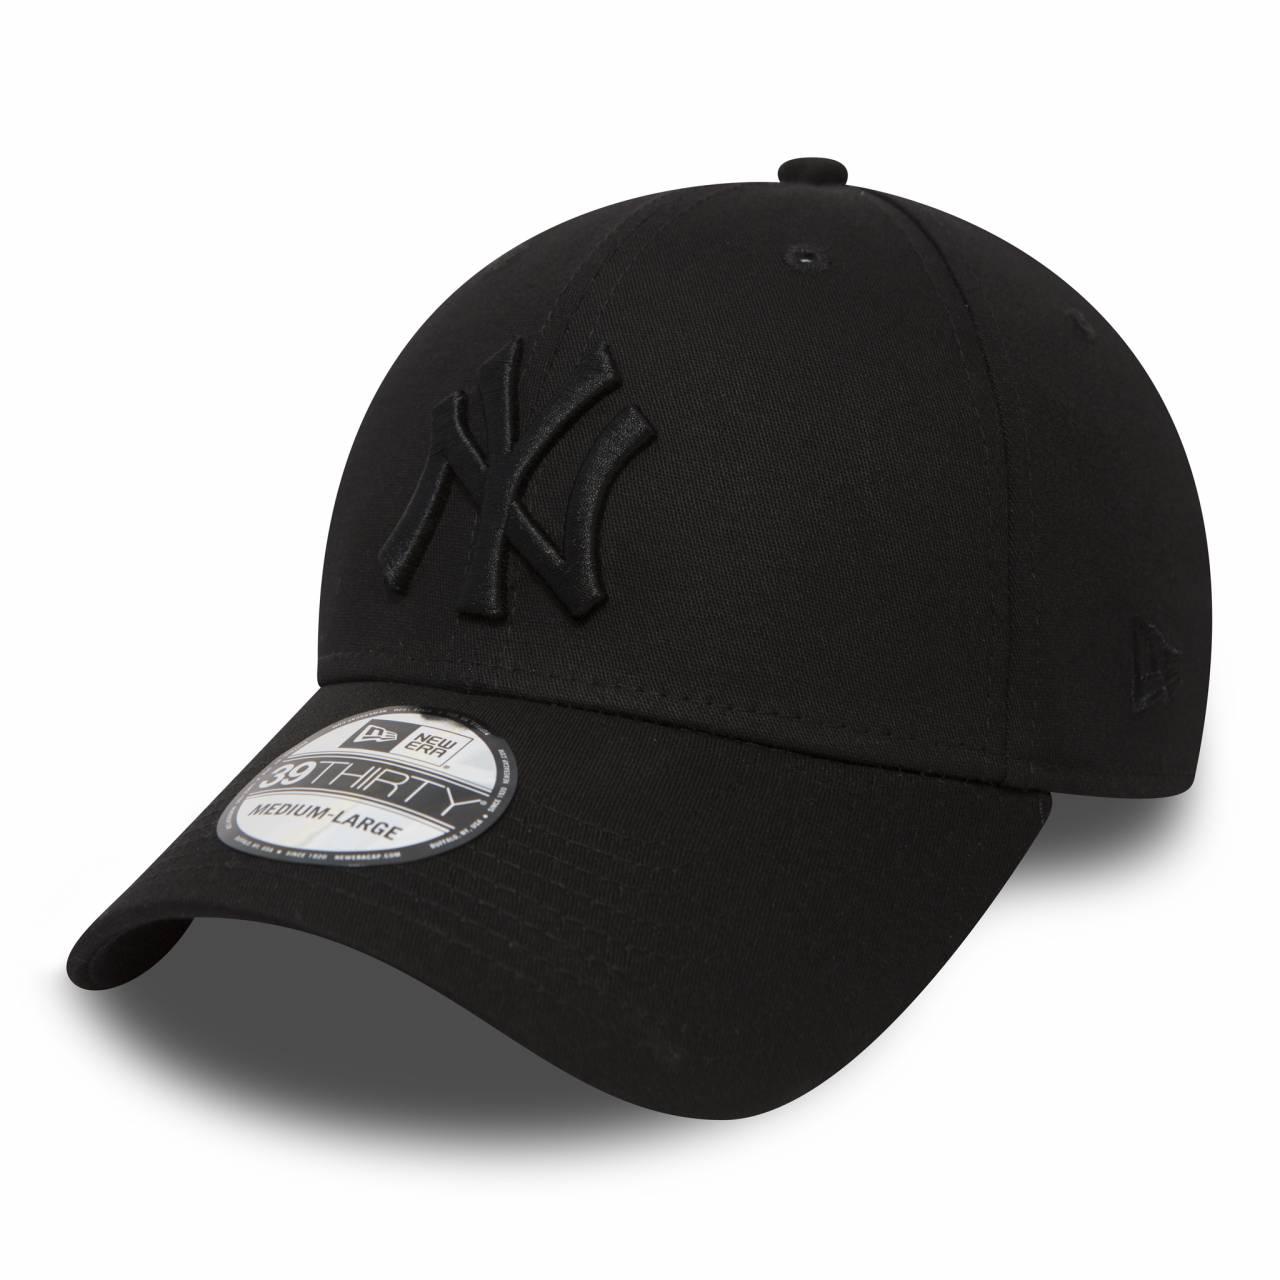 10145637 39THIRTY NEW YORK YANKEES STRETCH BLACK/BLACK CAP